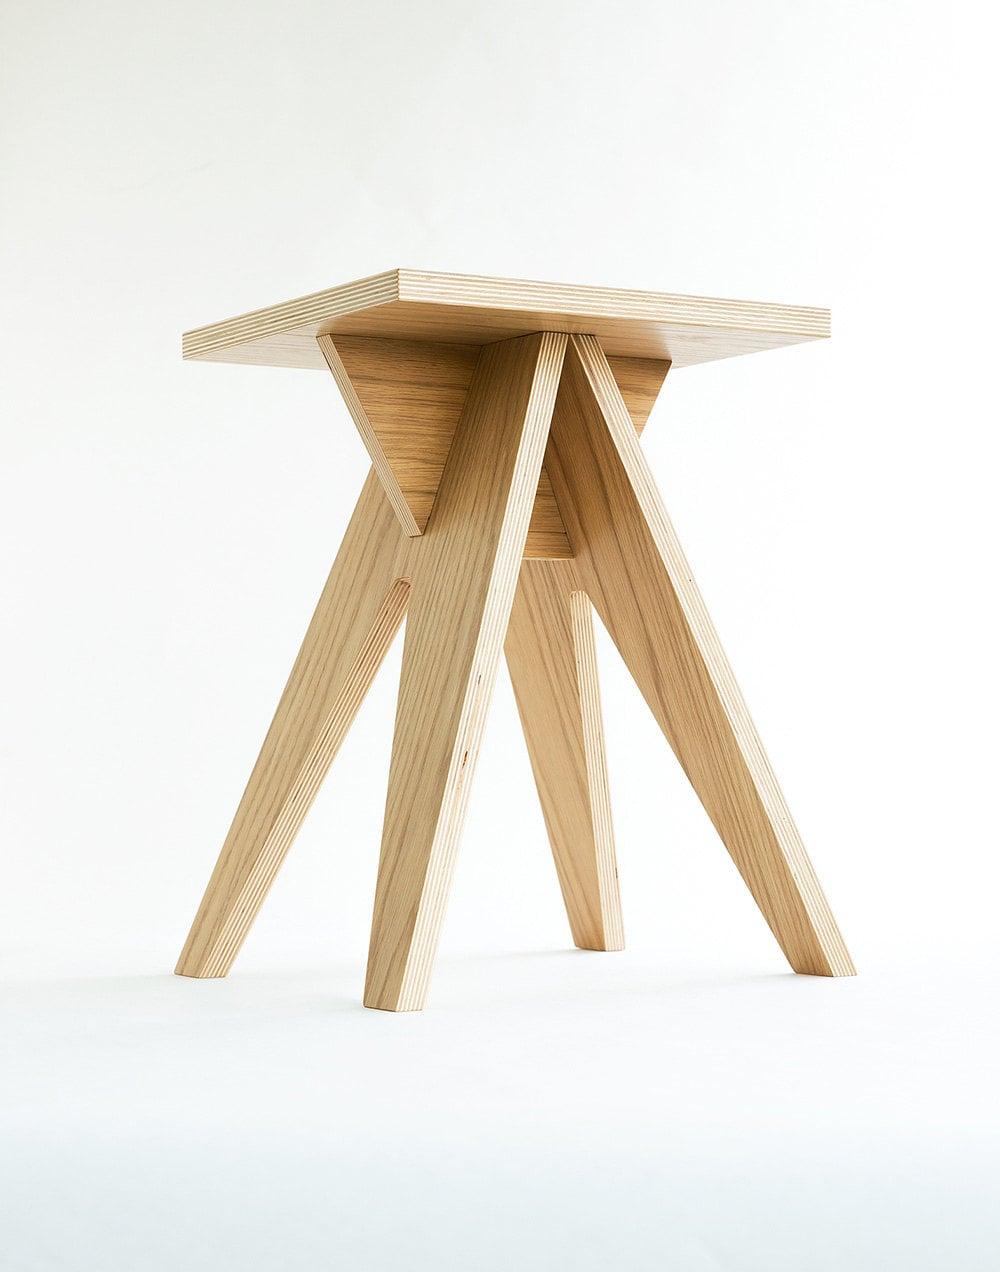 Hedgehog Dismountable Plywood Stool